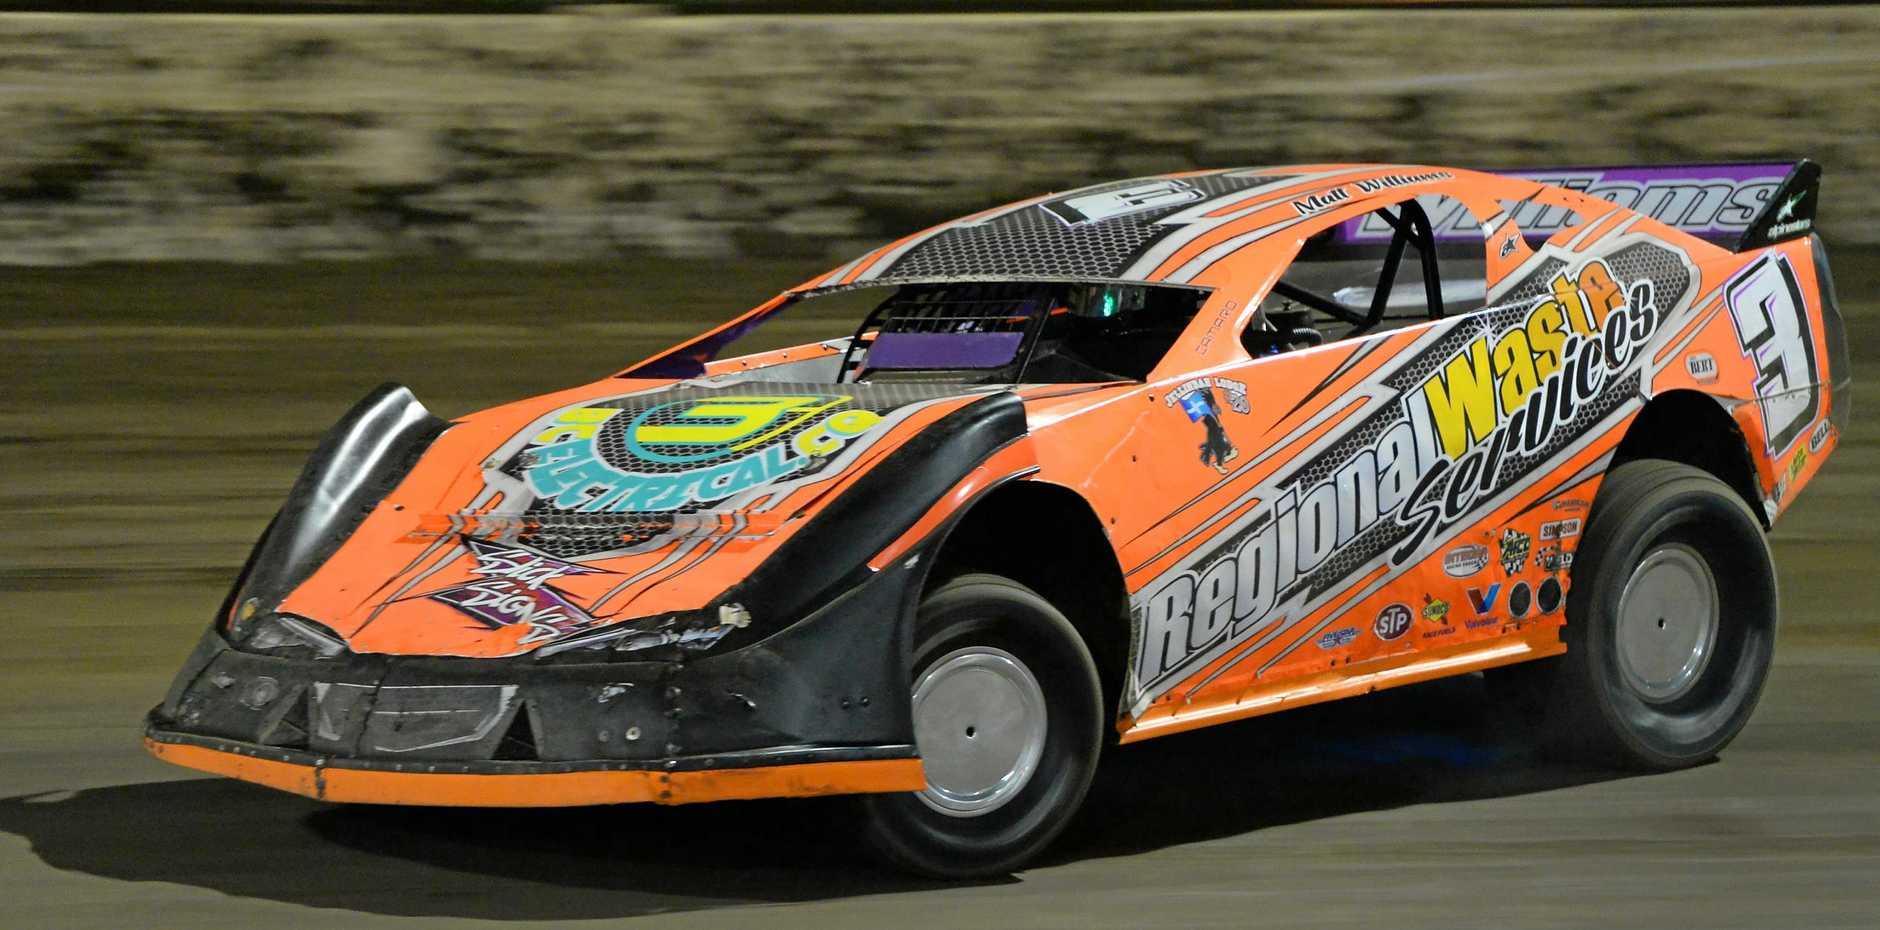 Matt Williams competing in a Super Sedan heat at the Rockhampton Speedway on Saturday night.